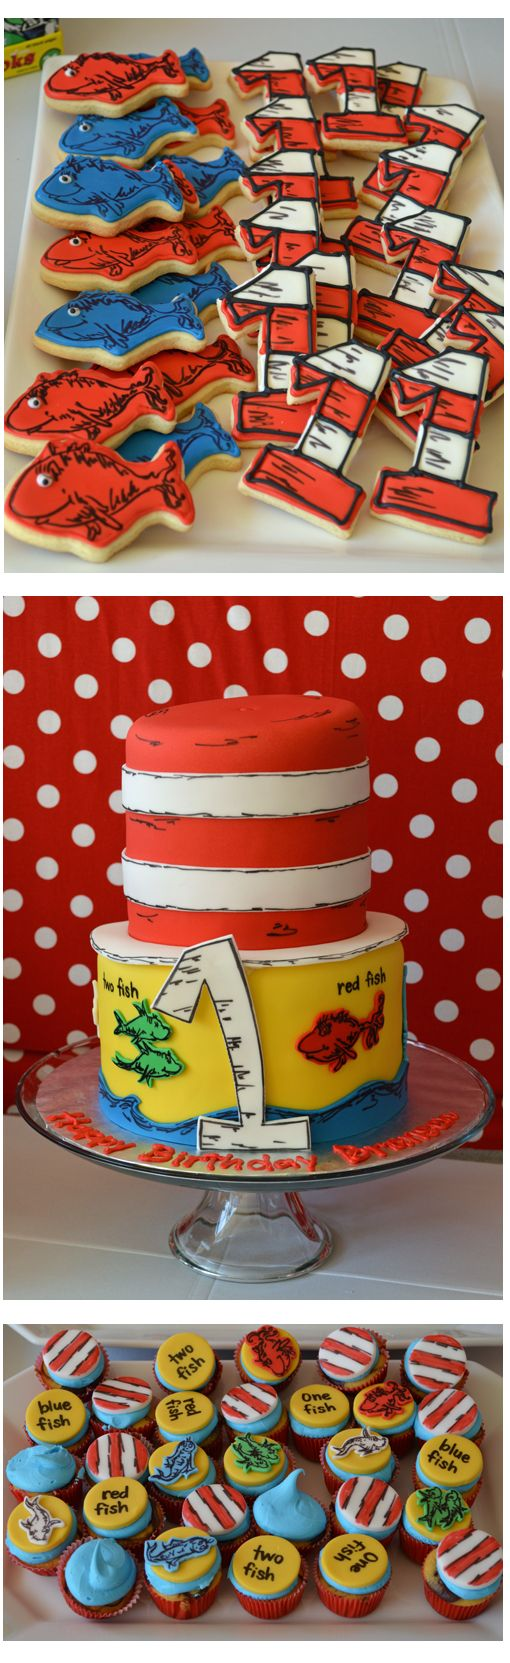 Dr Seuss 1st Birthday Party Ideas Dr Seuss Birthday Party Baby First Birthday Boy Birthday